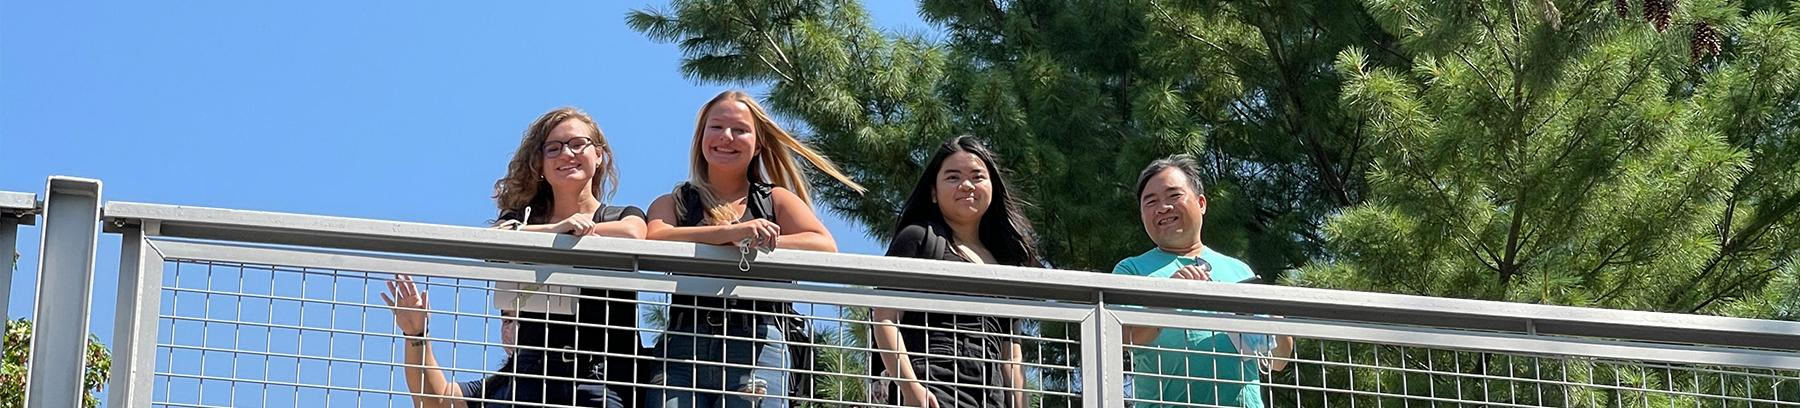 Students standing on the Century bridge